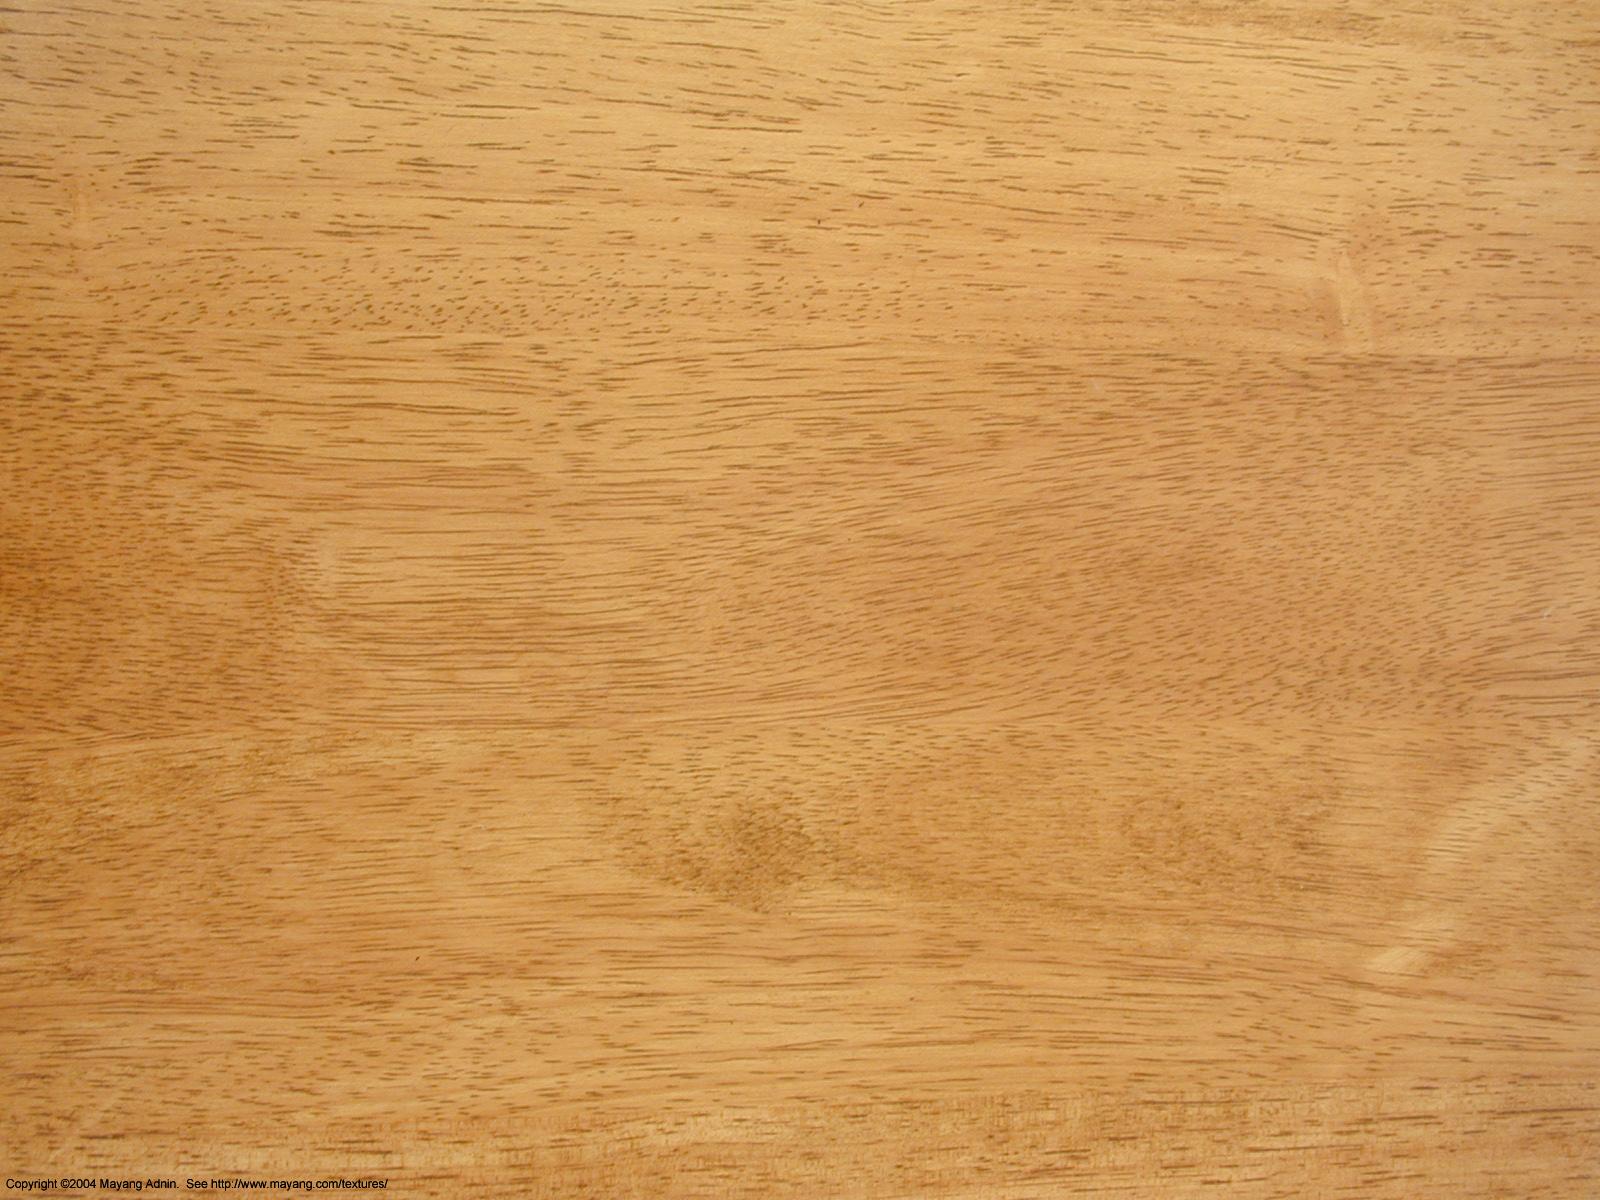 editor audiovisuals el templat textura madera  backgrounds wood grain vector free download wood grain vector black and white